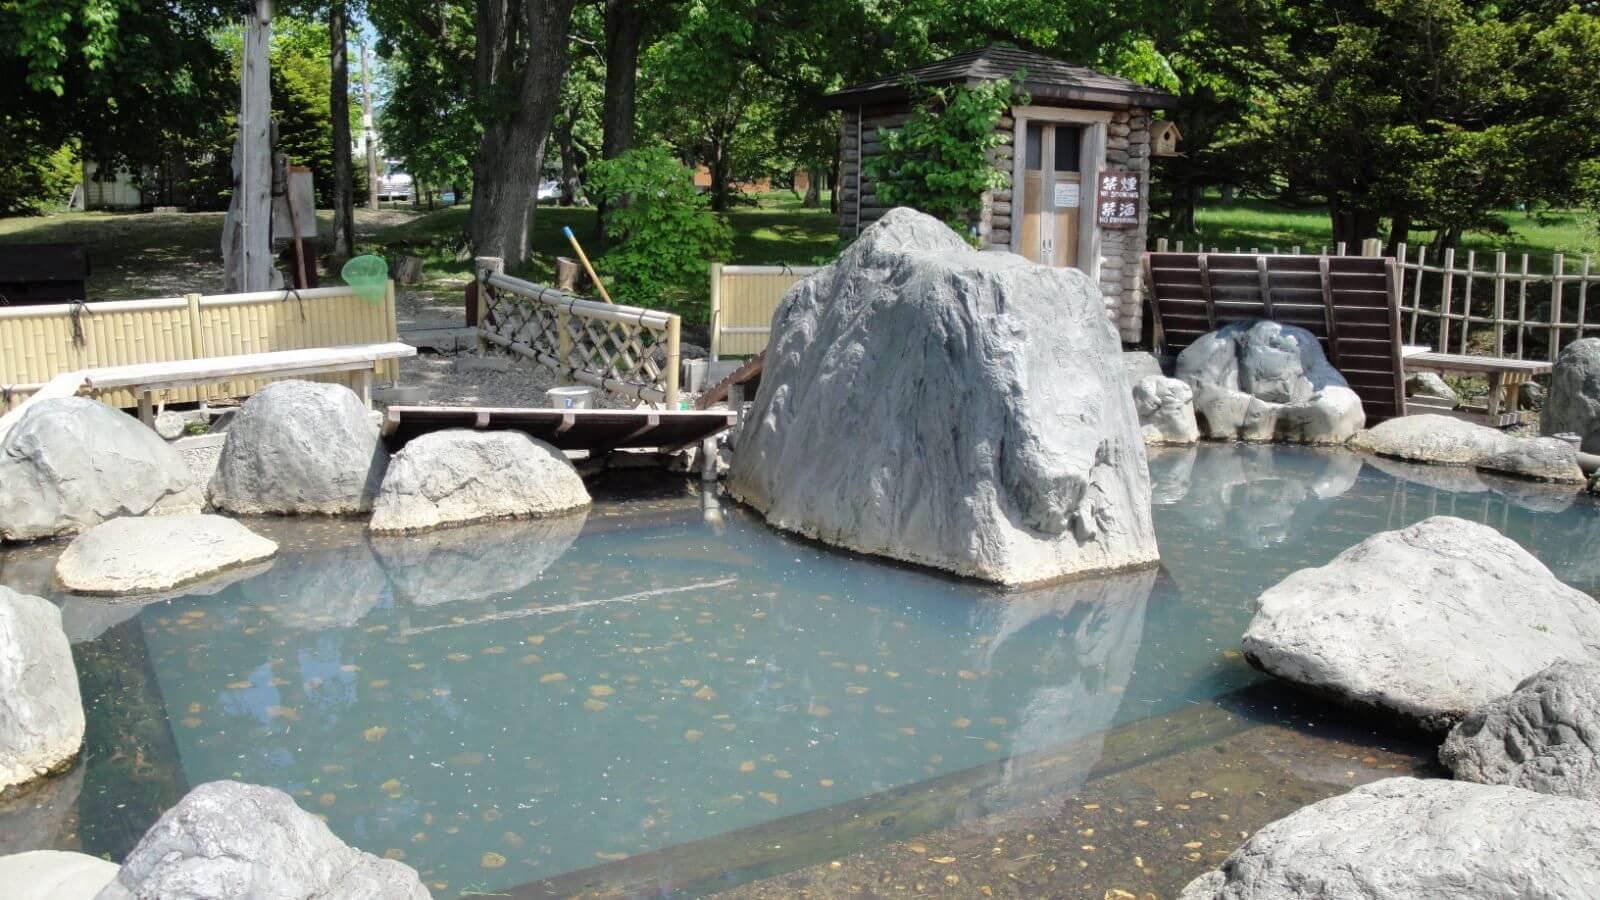 Kotan Onsen: Where Hot Spring Meets Nature